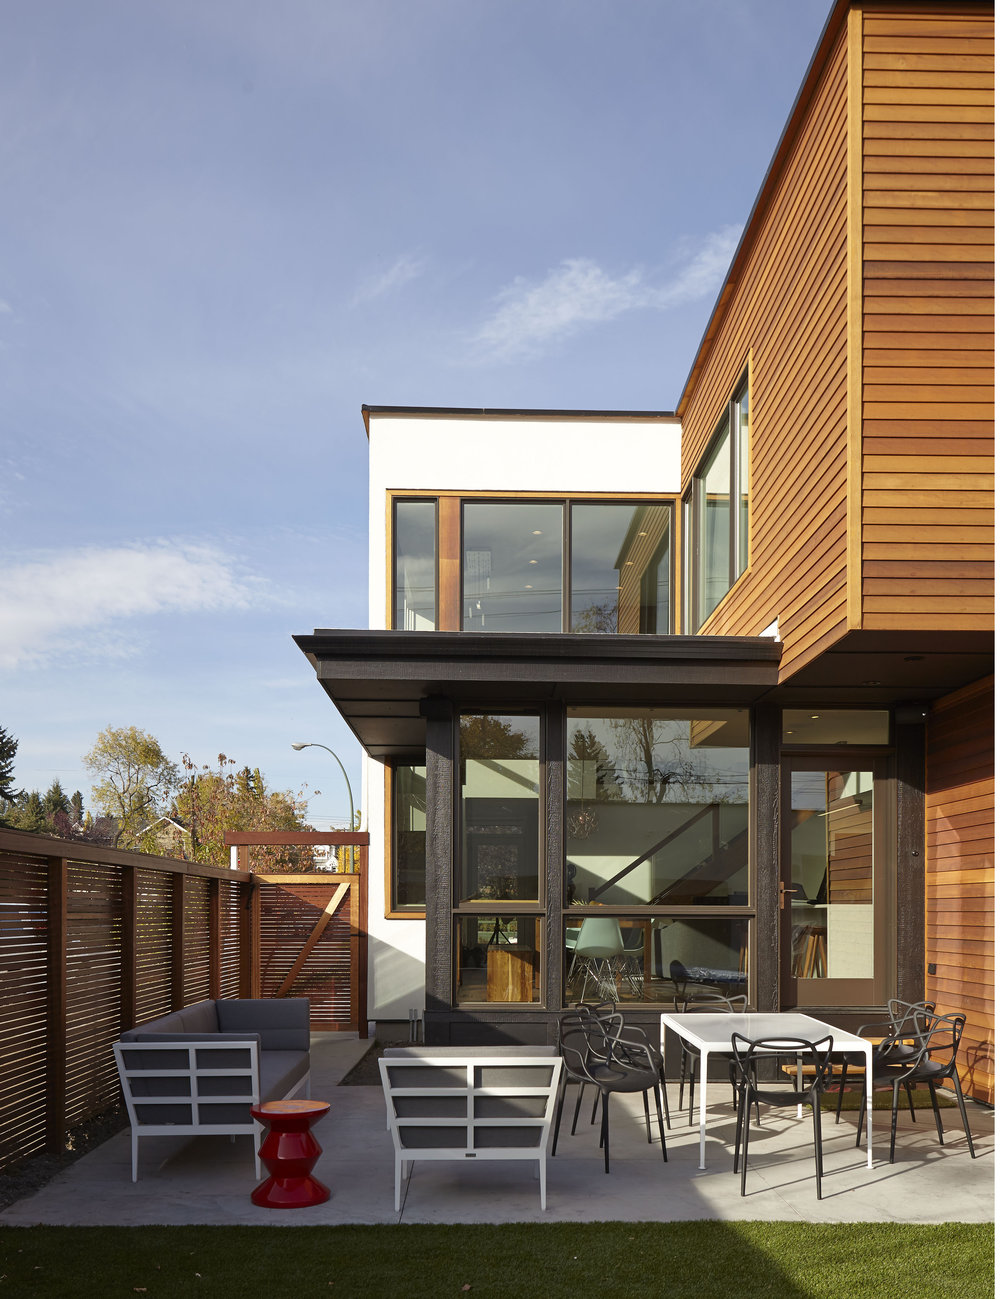 turkel_modern_design_prefab_home_bankview_house_calgary_outdoor.jpg